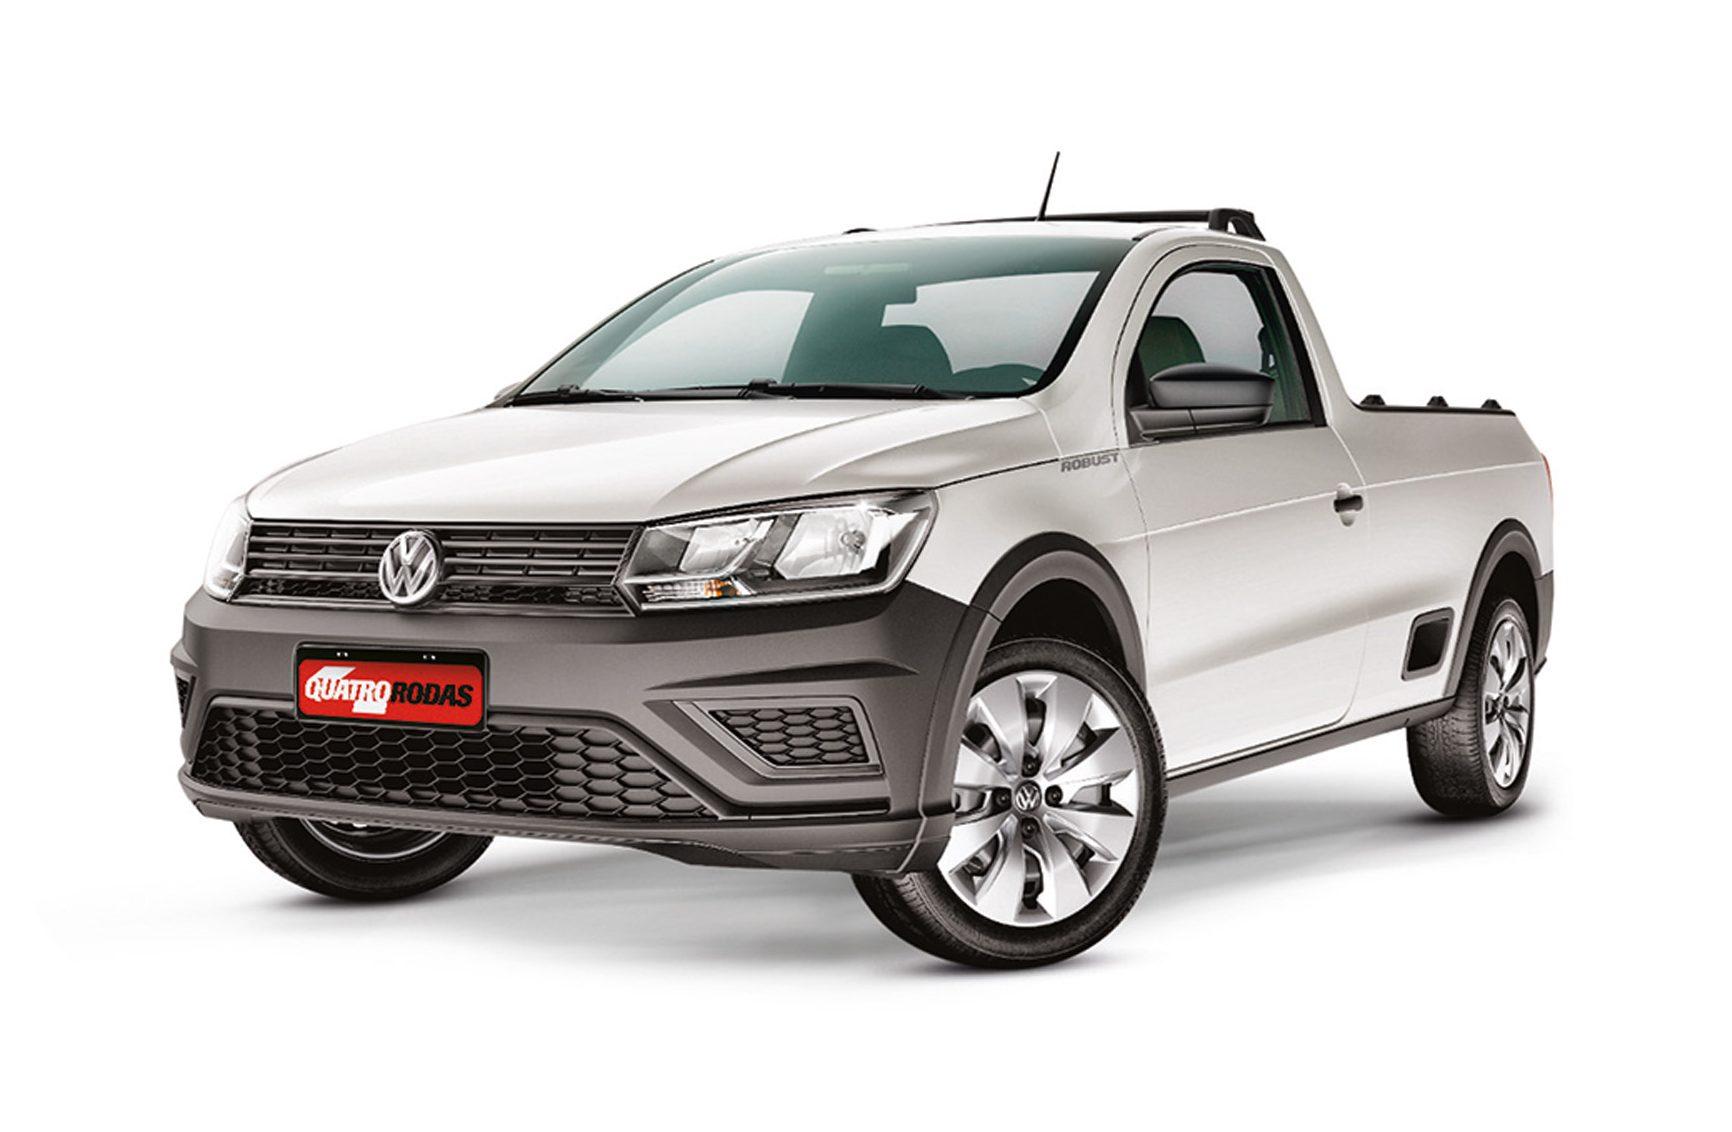 VW Saveiro Robust CS